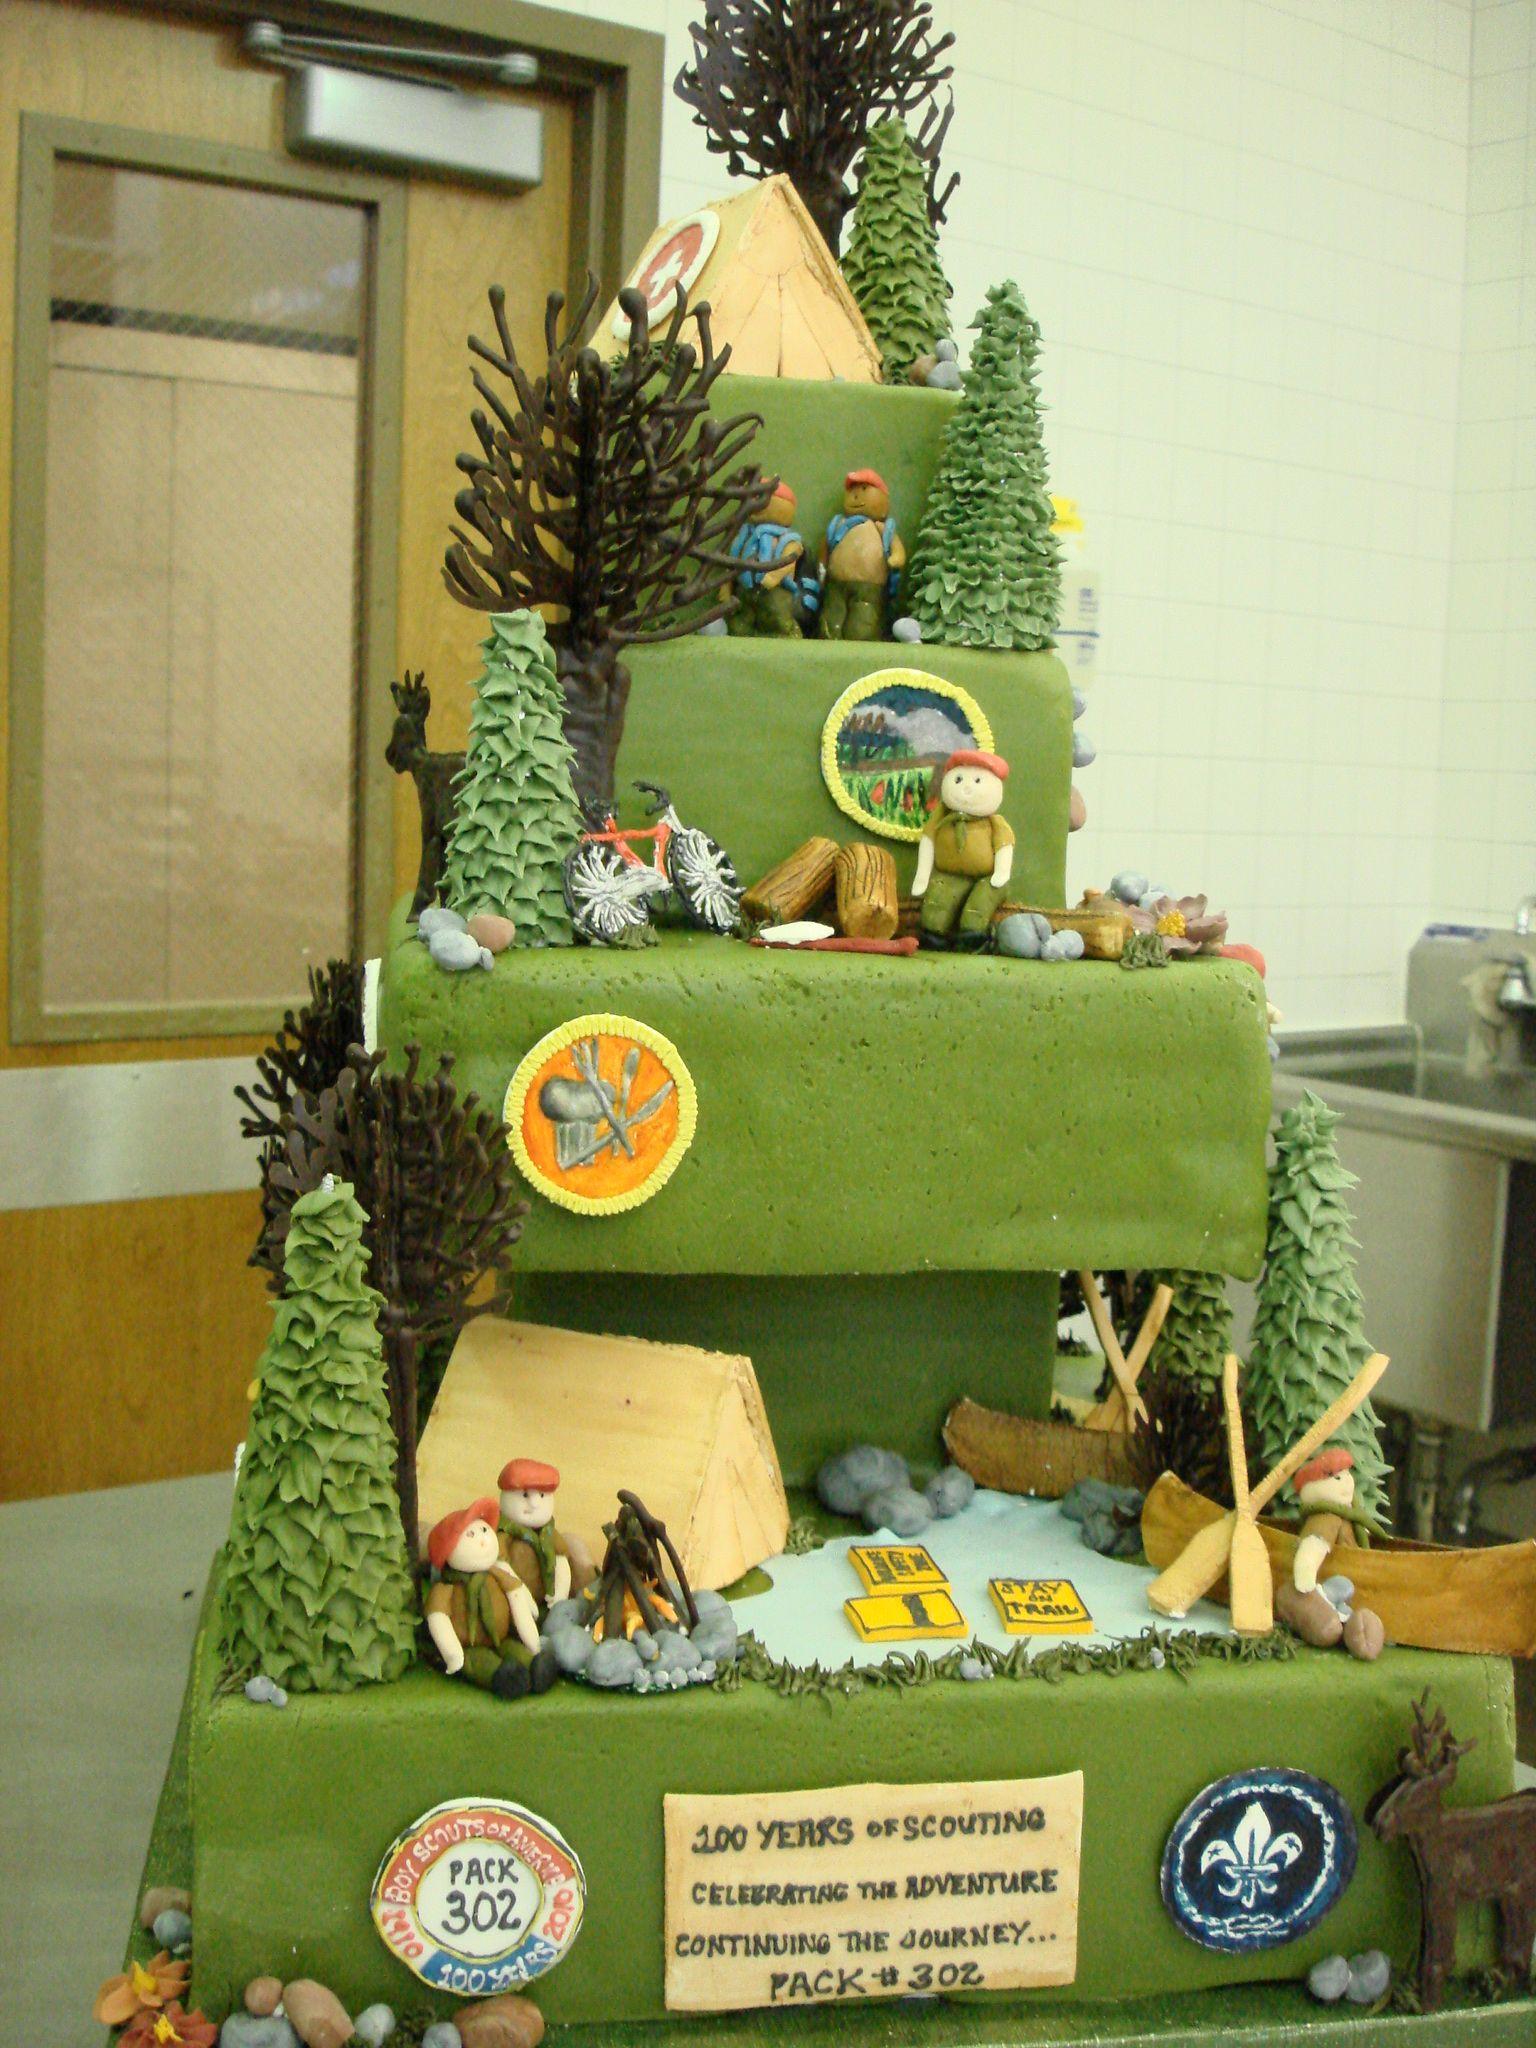 Cub Scout Cake Decorations